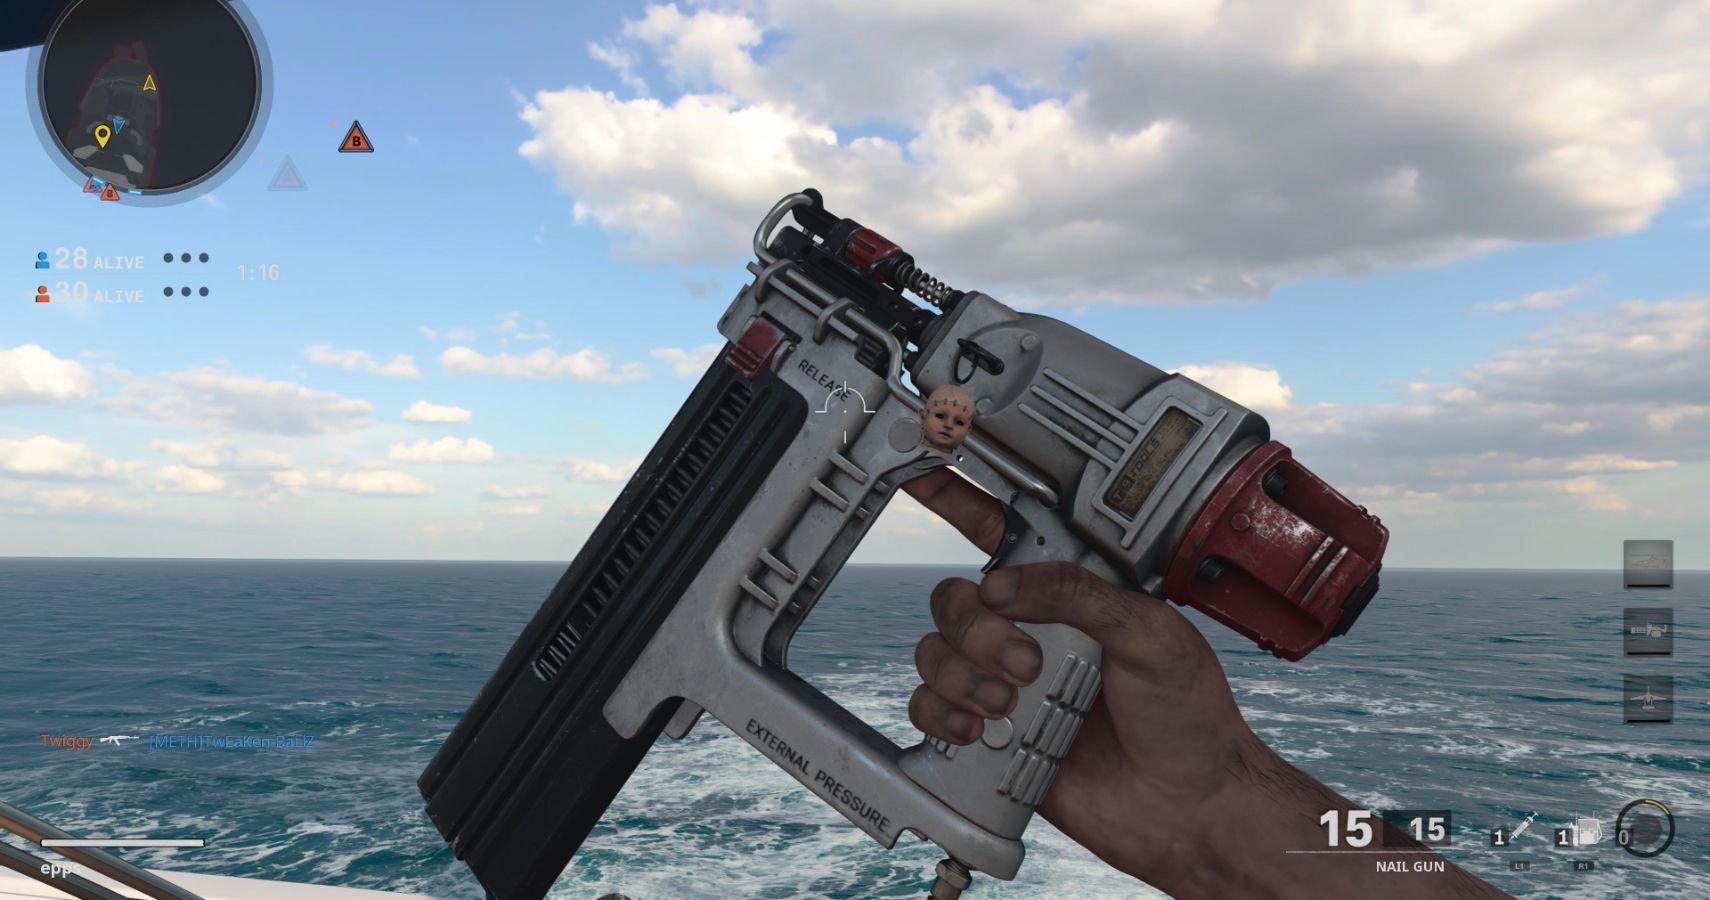 COD Black Ops & Warzone: How To Unlock The Nail Gun